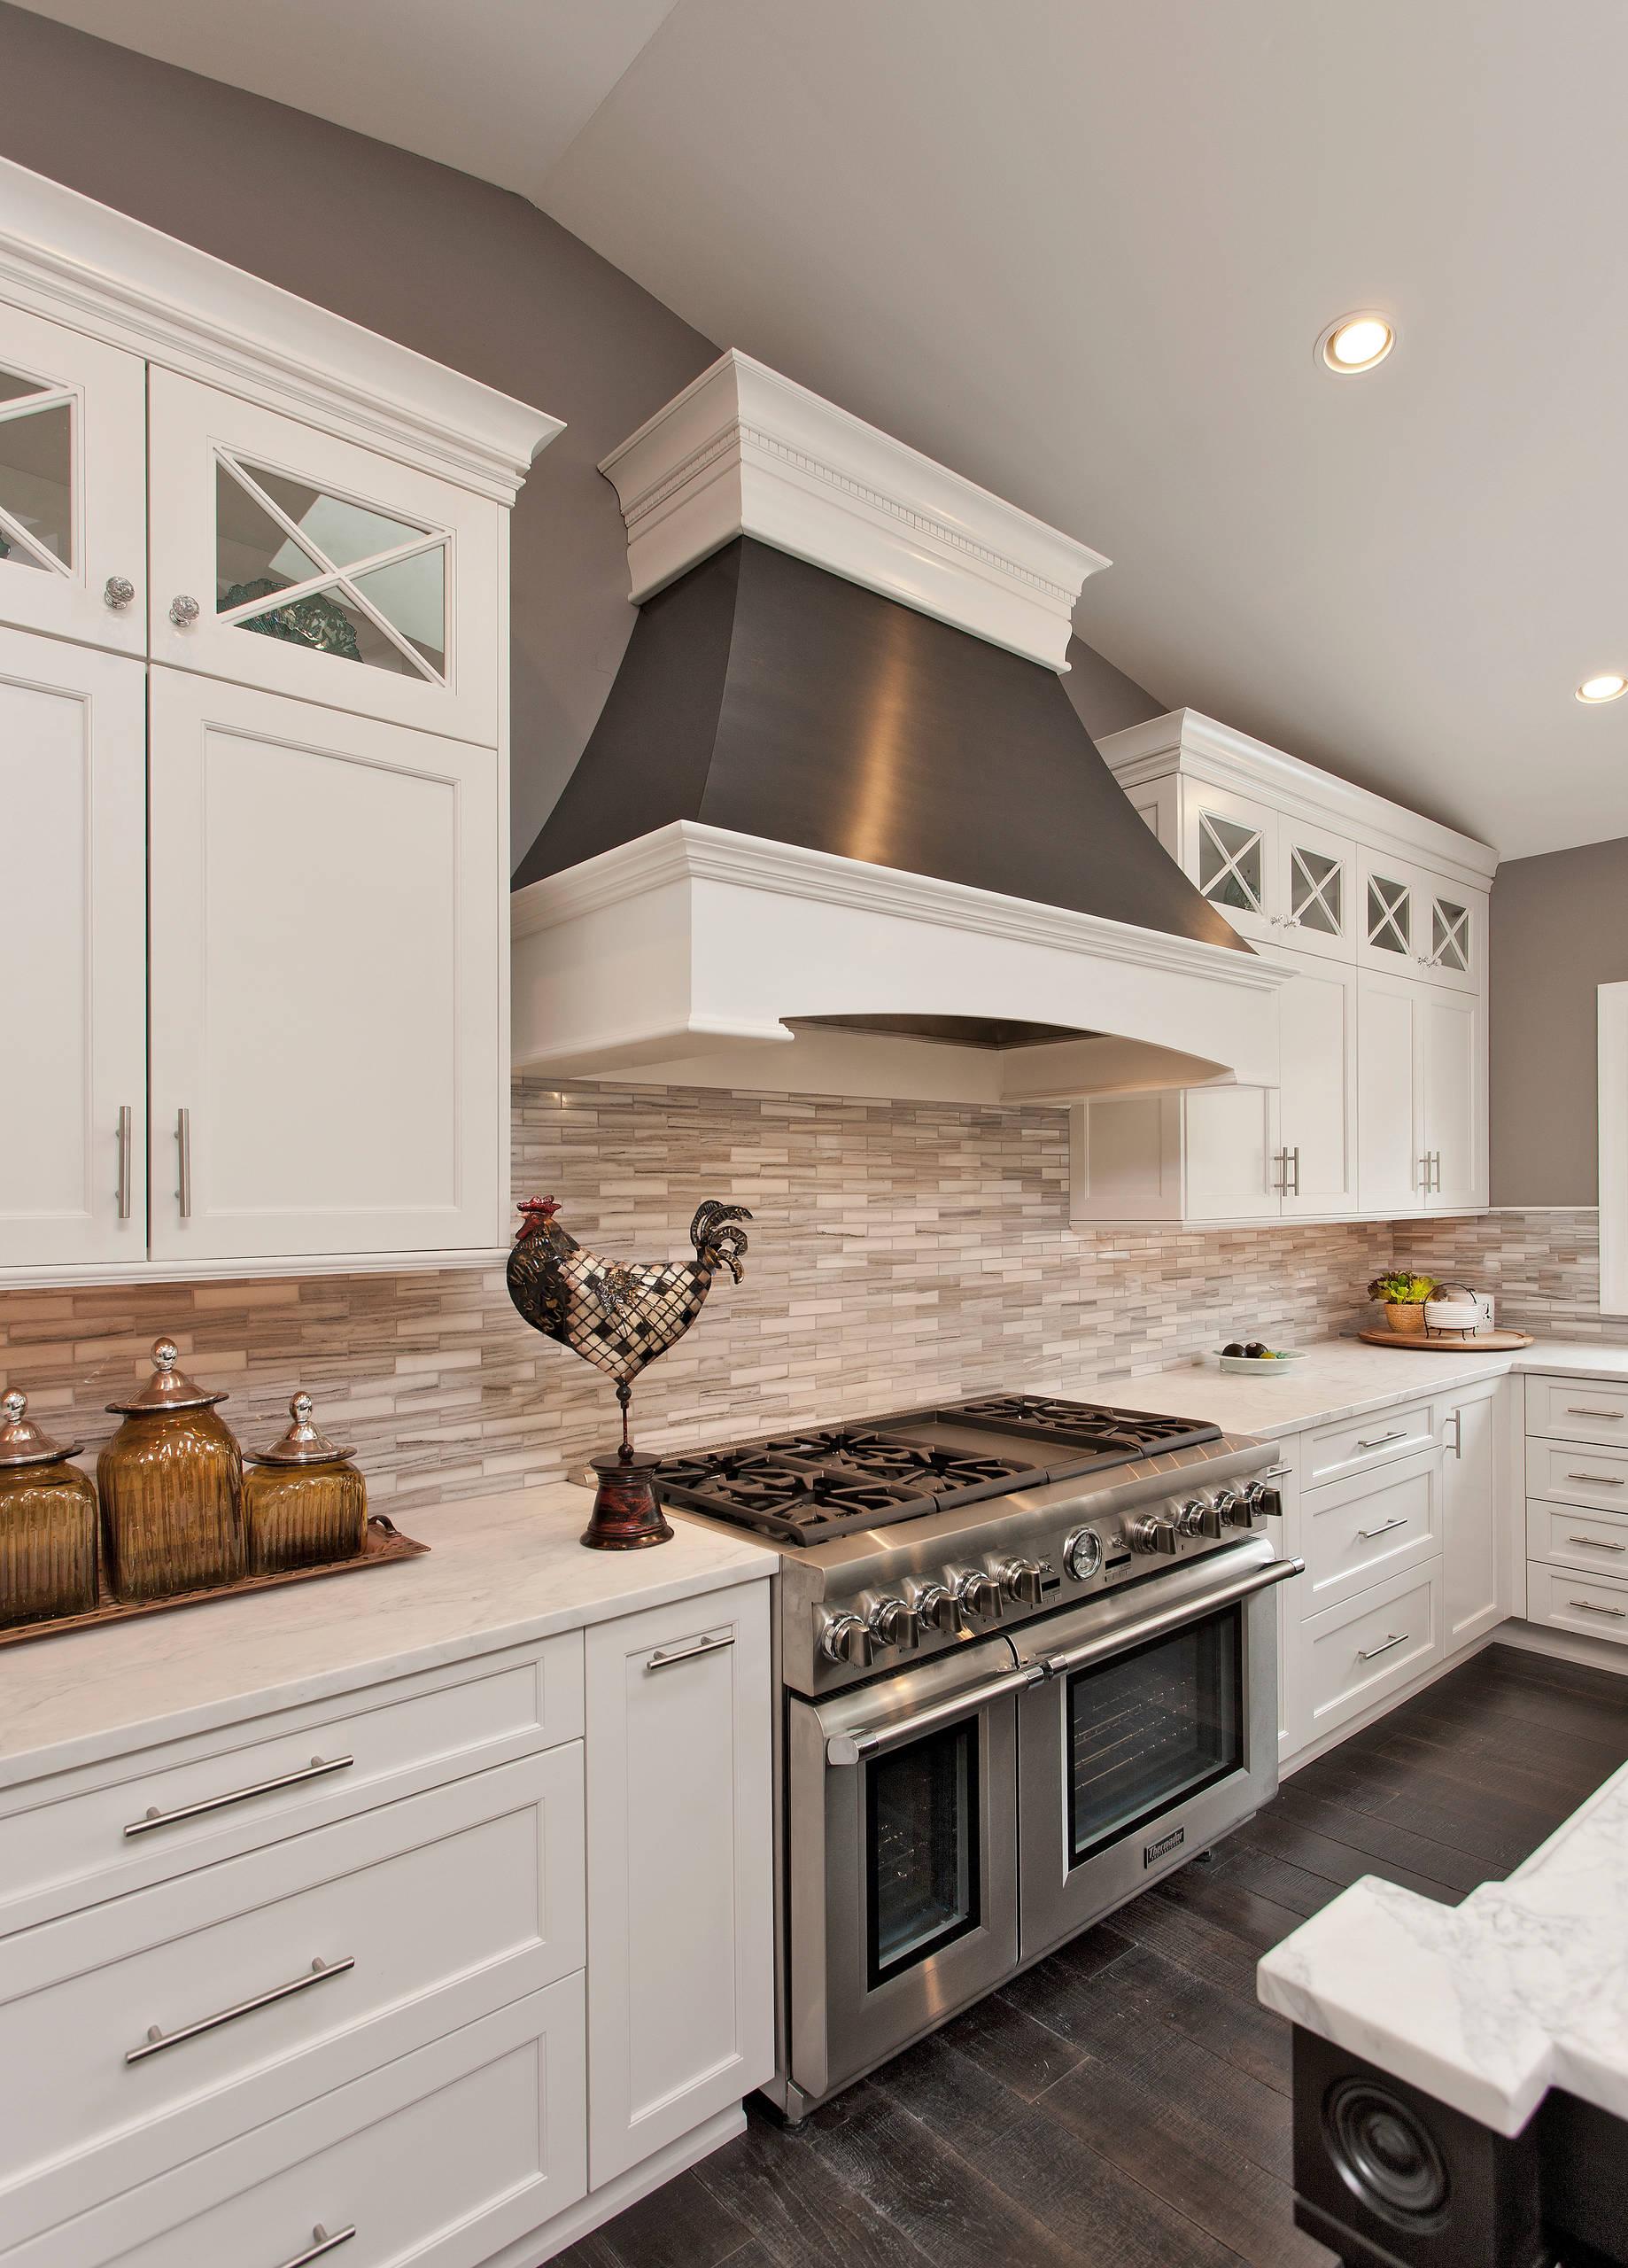 75 Beautiful Kitchen With Stone Tile Backsplash Pictures Ideas January 2021 Houzz